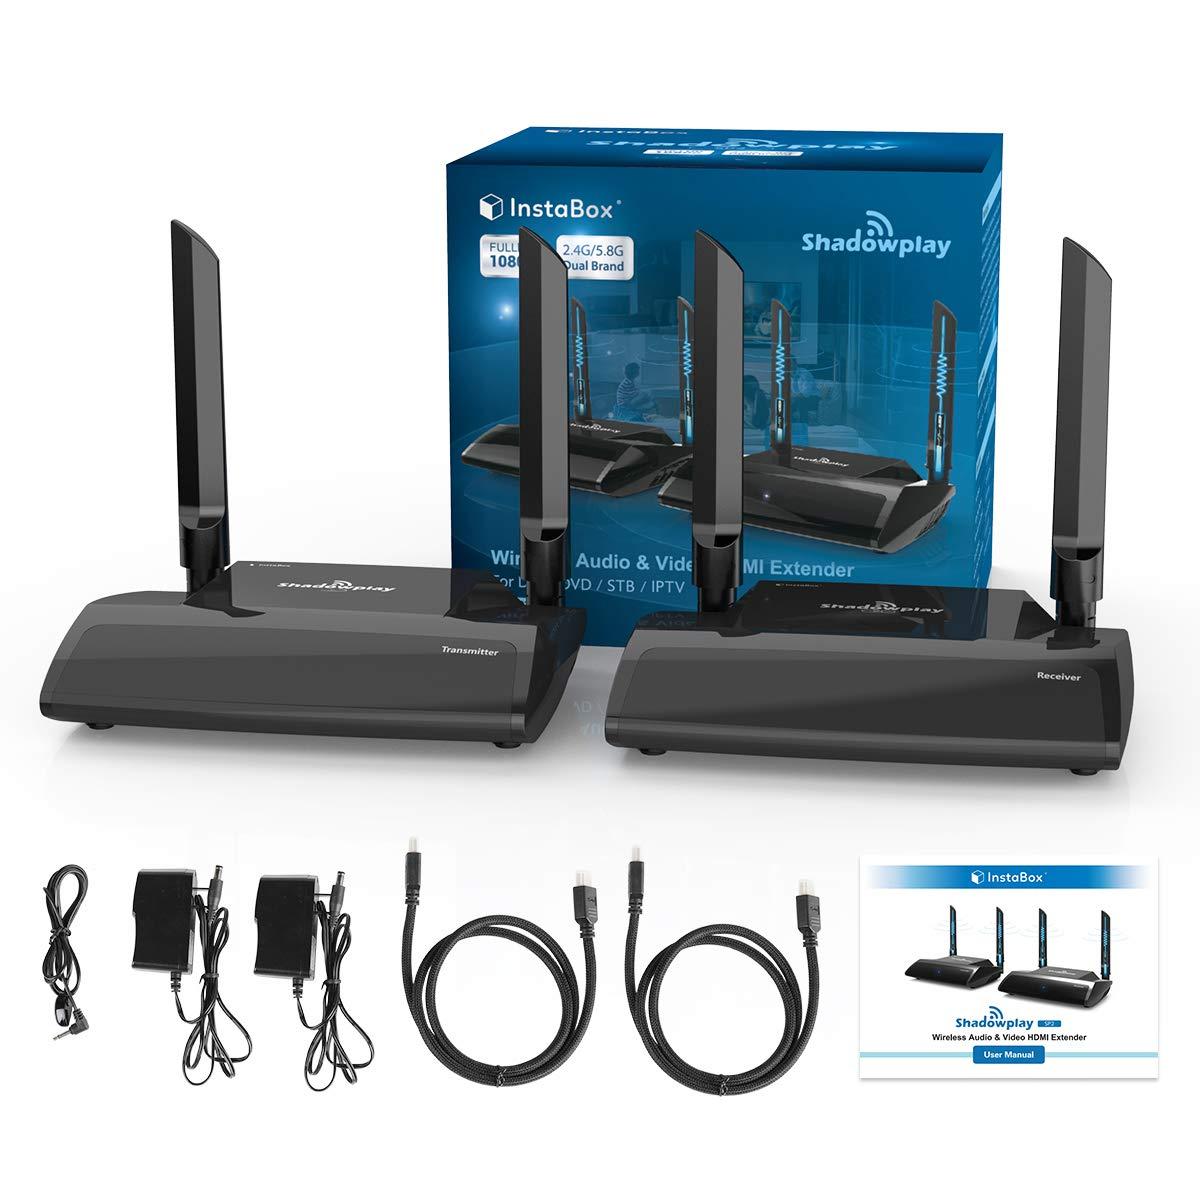 InstaBox Shadowplay SP2 1080P 3D Wireless HDMI Transmitter & Receiver Kit  Up to 330 ft, AV Sender Receiver w/IR Transmission, HDMI Extender Streaming